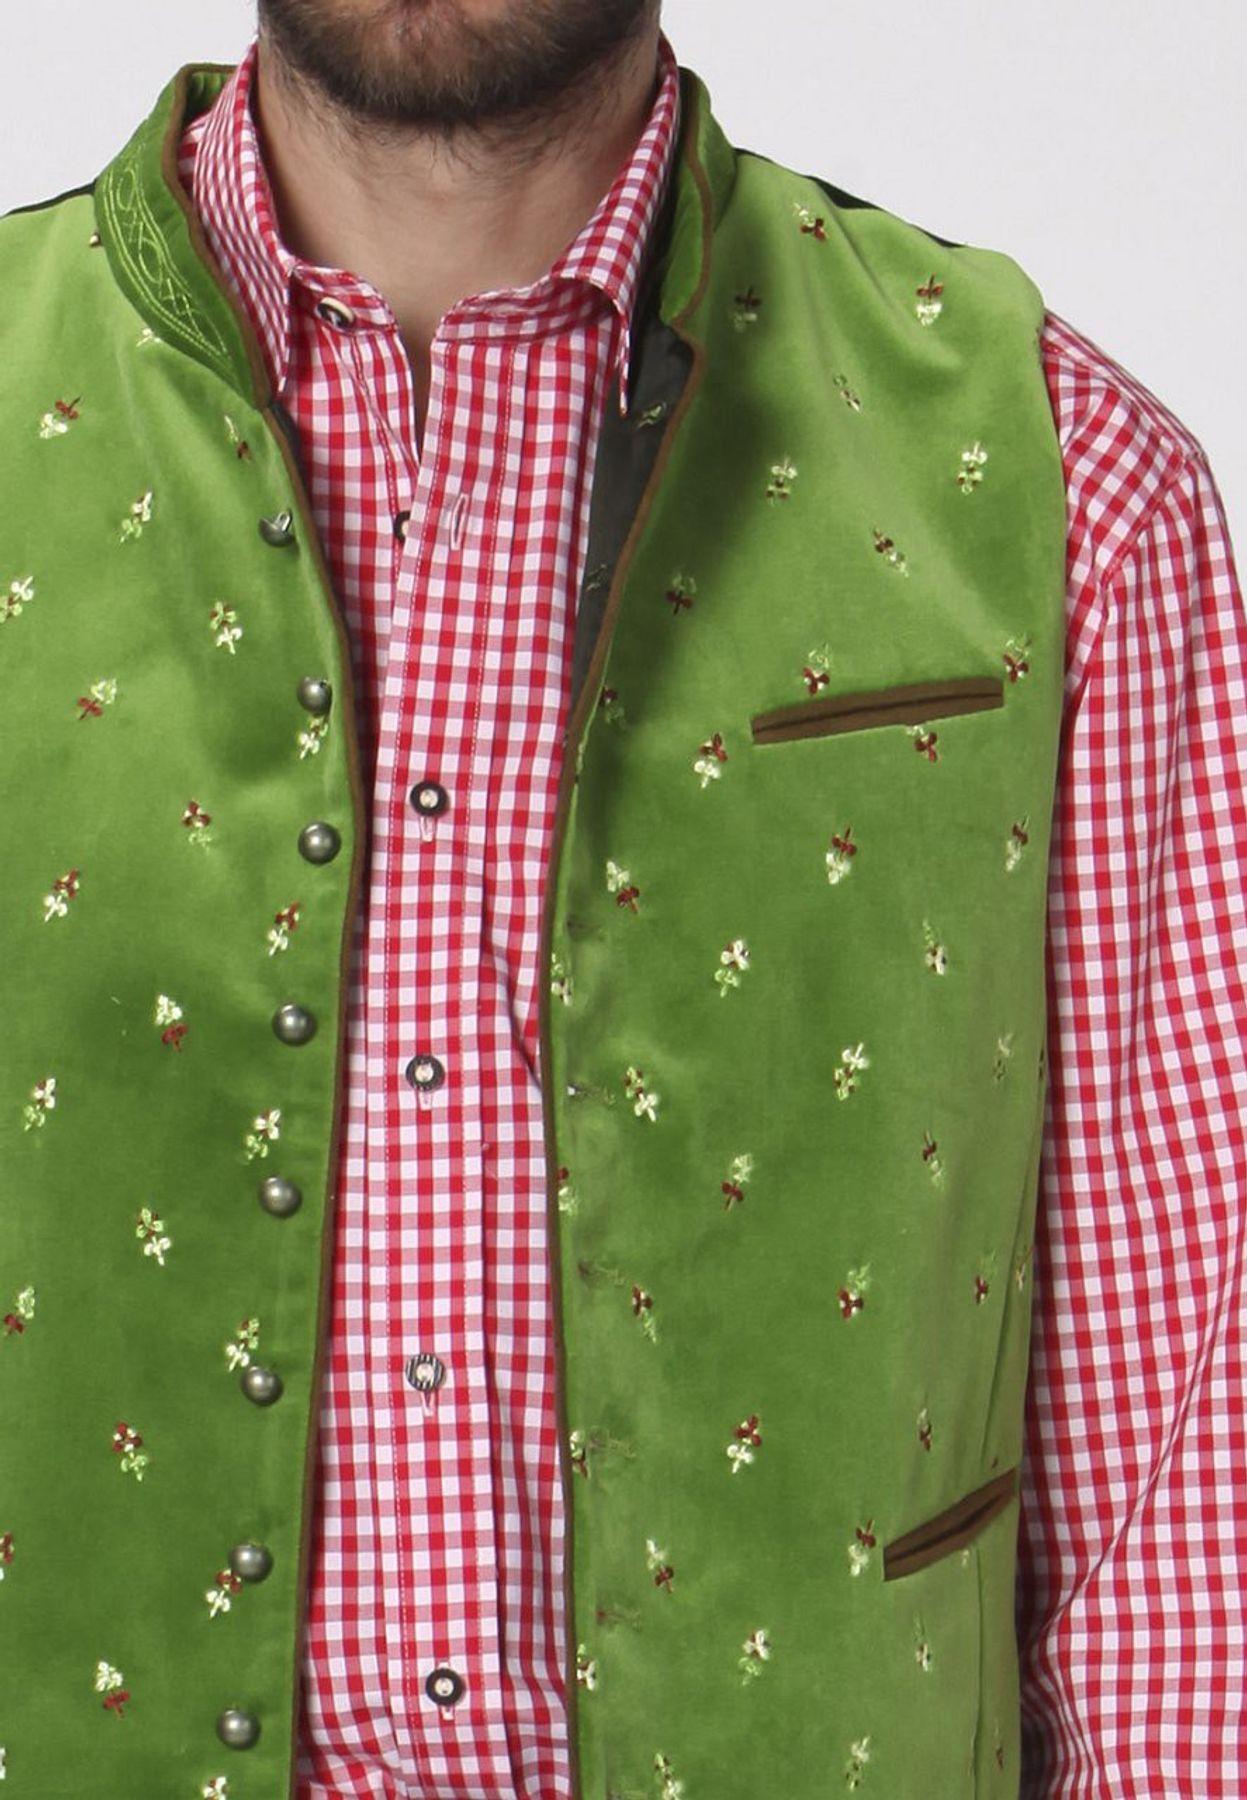 Stockerpoint - Herren Trachten Weste in verschiedenen Farbtönen, Calzado – Bild 15